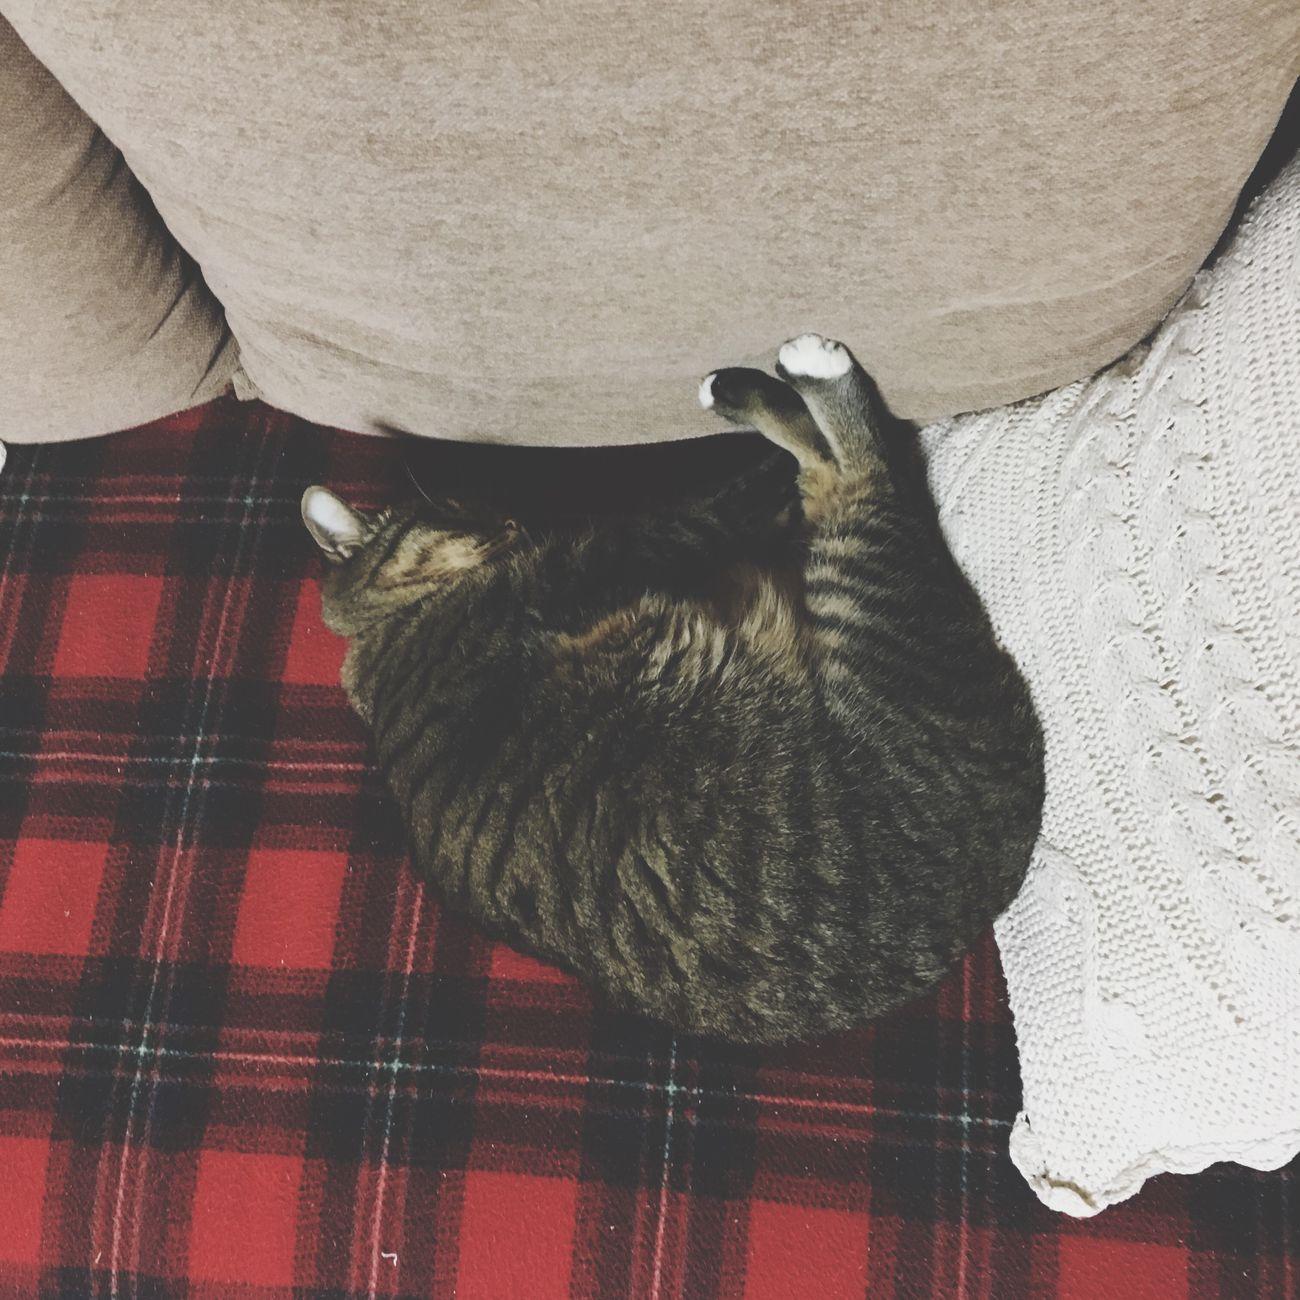 Animal Themes I Love My Cat My Cats Cat♡ Cat Cats 🐱 One Animal Pets Animal Animals Indoors  Cats Of EyeEm Domestic Cat Domestic Animals